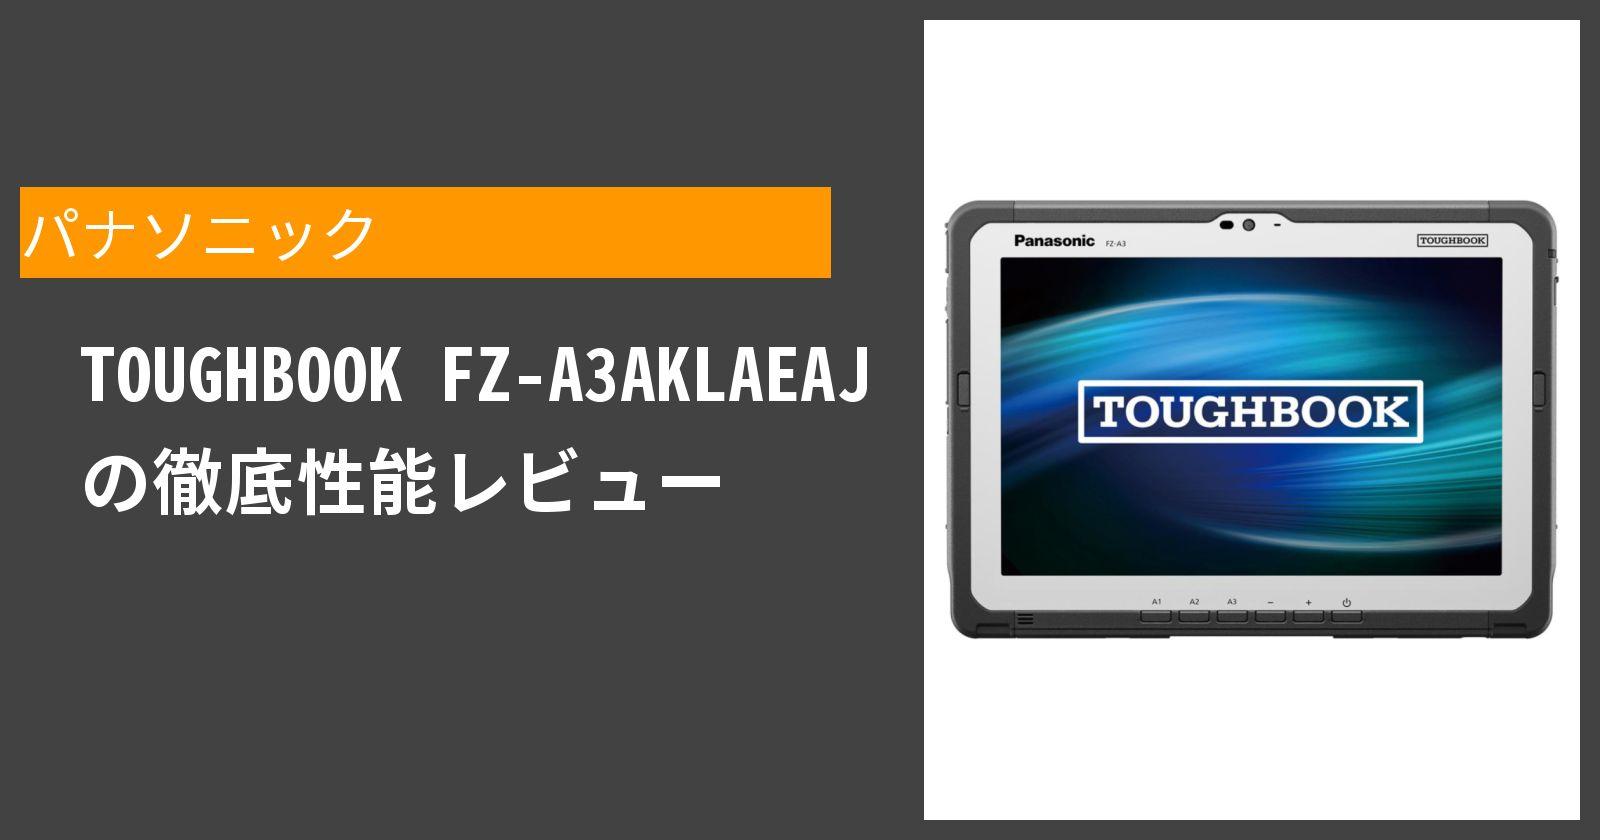 TOUGHBOOK FZ-A3AKLAEAJ の徹底性能レビュー